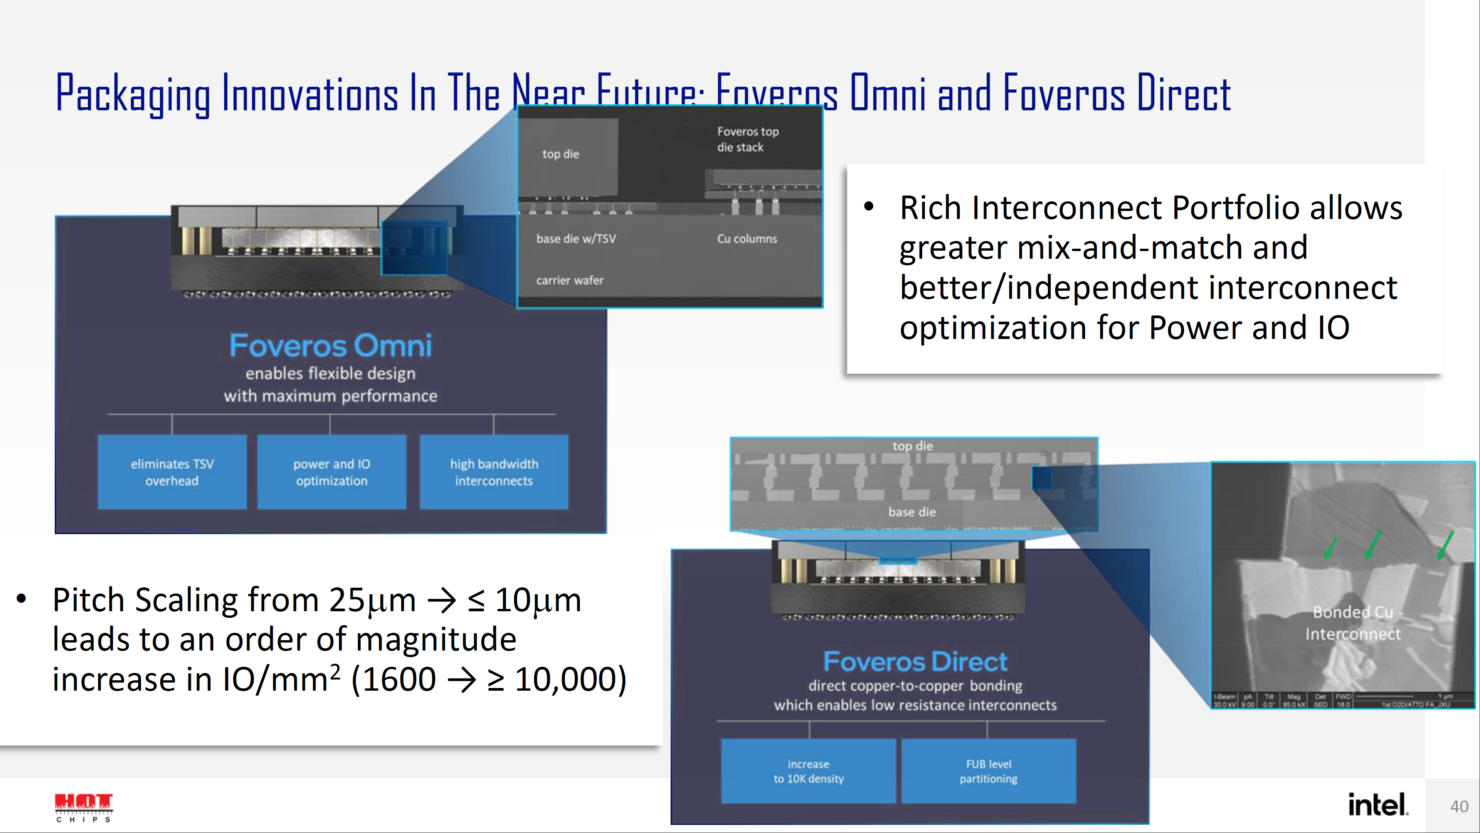 intel-sapphire-rapids-sp-xeon-hbm-cpu-ponte-vecchio-gpu-with-emib-forveros-packaging-technologies-_10